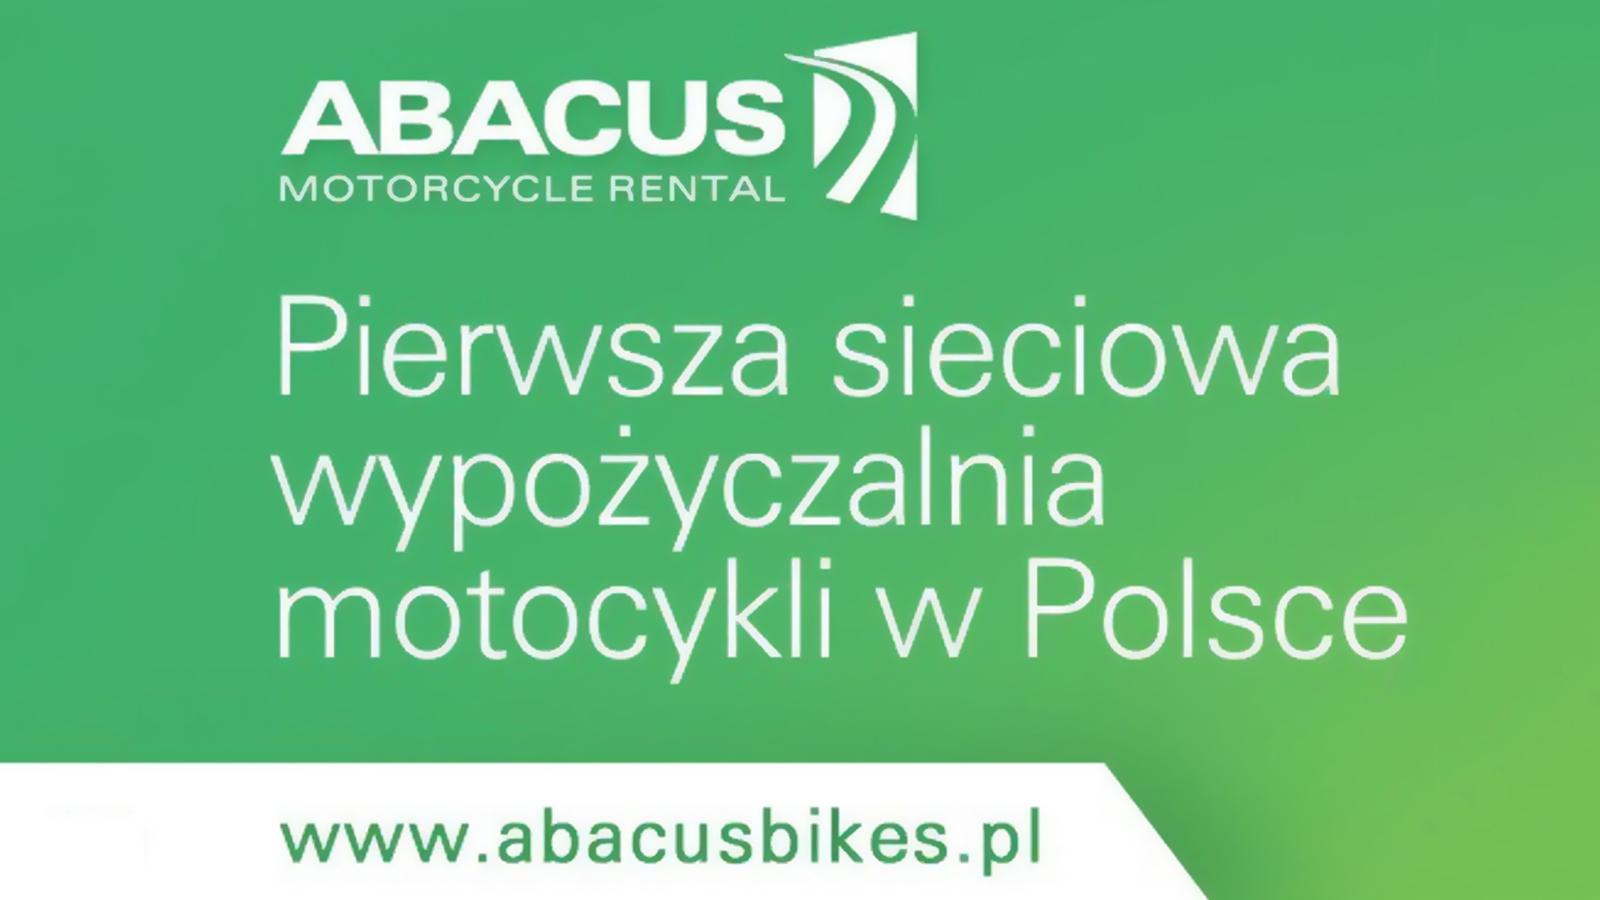 Abacus Bikes2